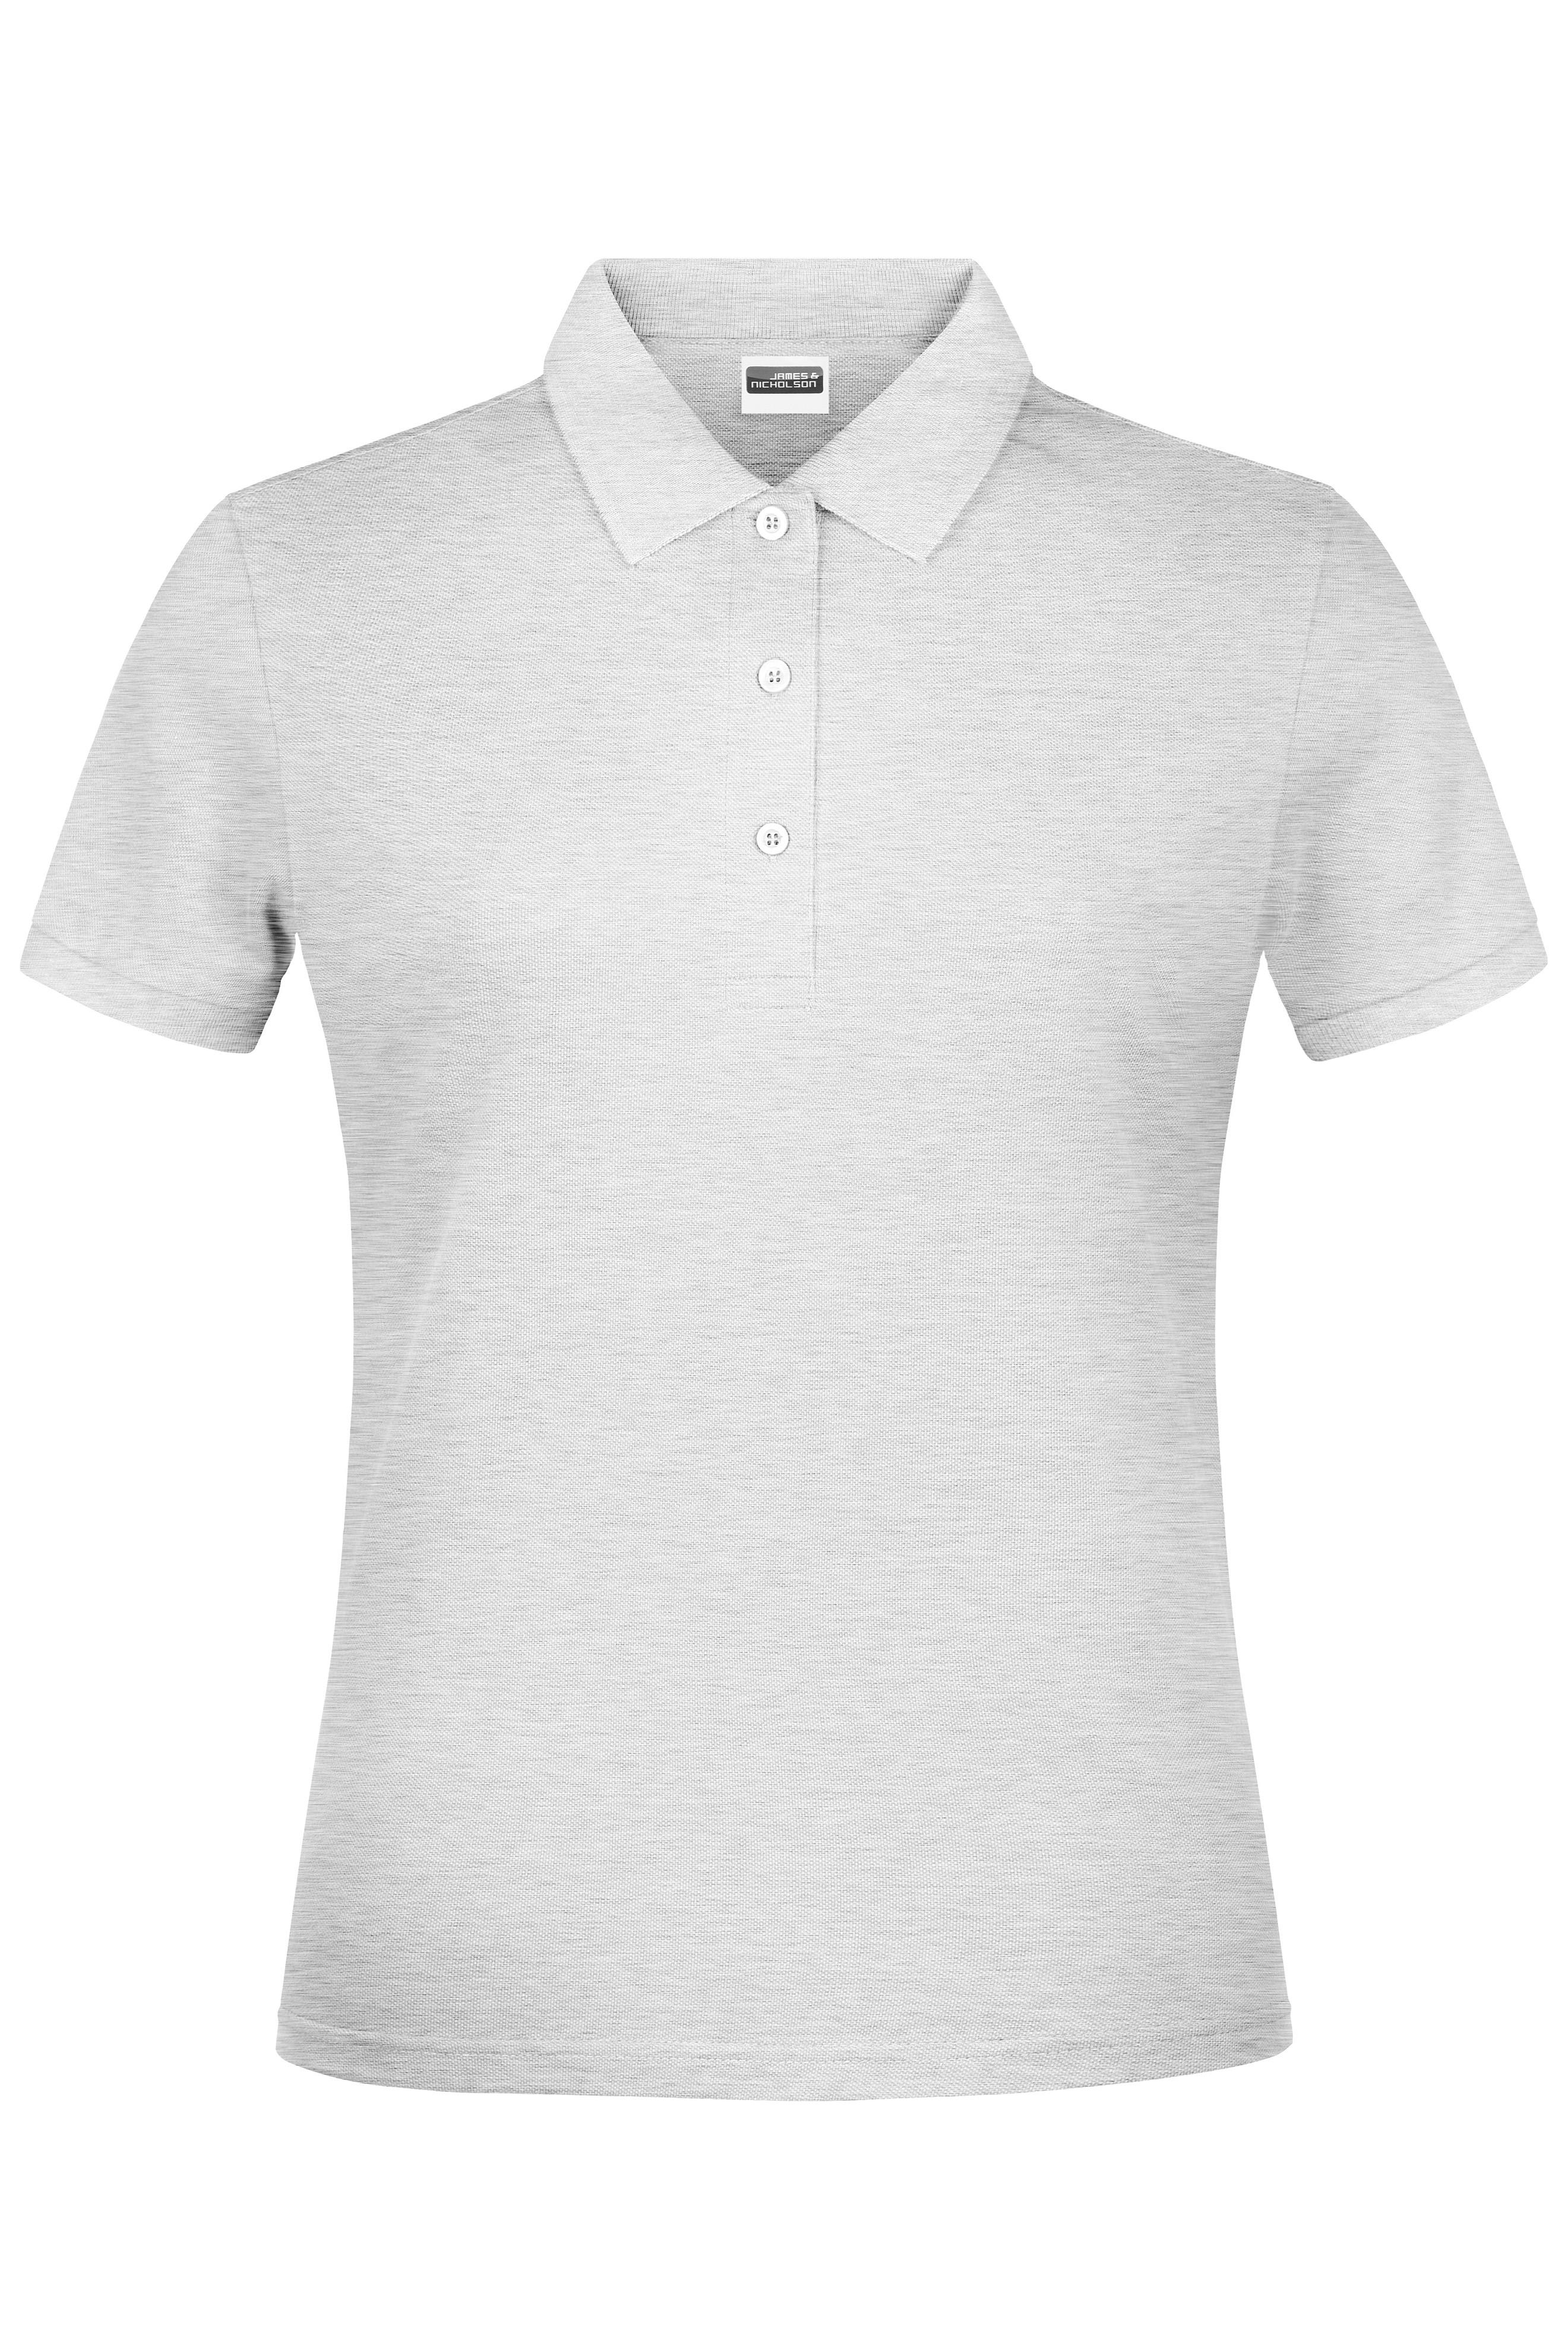 James /& Nicholson Damen Poloshirt LADIES COLDBLACK POLO Hemd Neu JN965